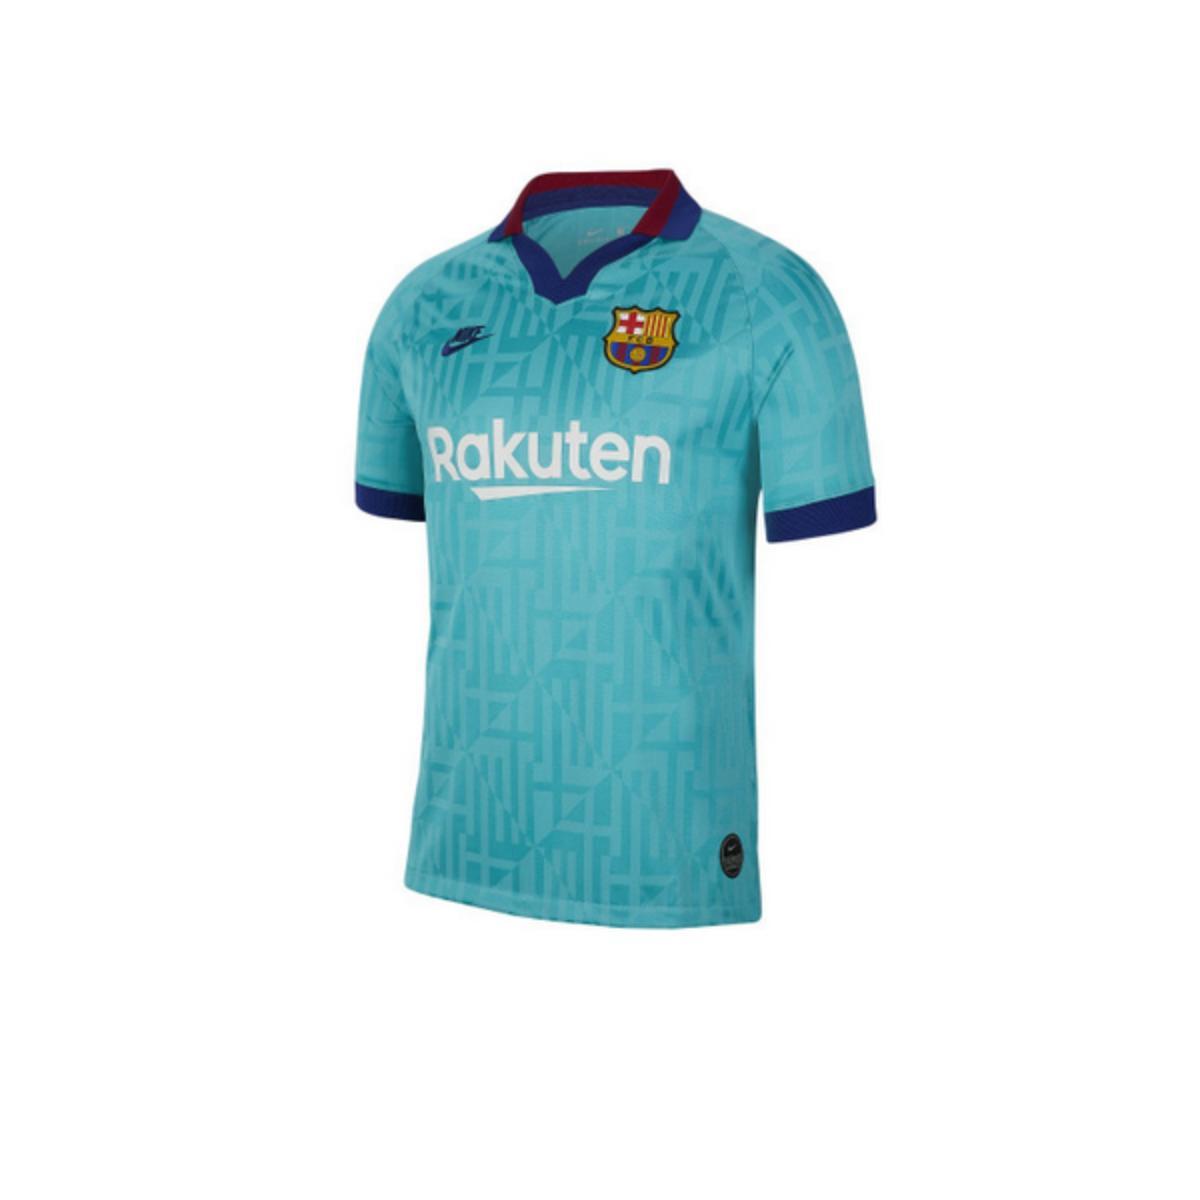 Camiseta Masculina Nike At0029-310 Breathe fc Barcelona Stadium Third Verde/royal/v